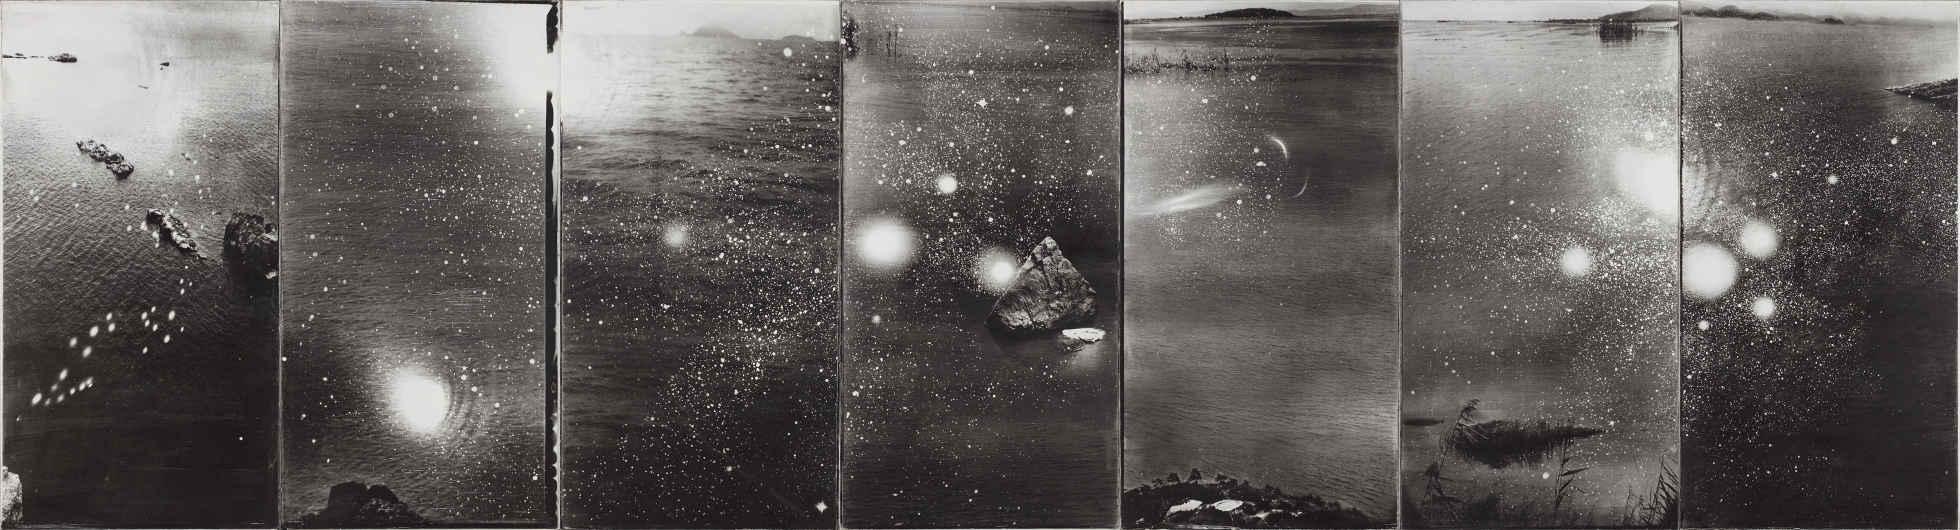 Shao Wenhuan, Indefinite...II, 2010, Photography, gelatin emulsion in silver halide on silk, 115 x 60cm x 7 panels